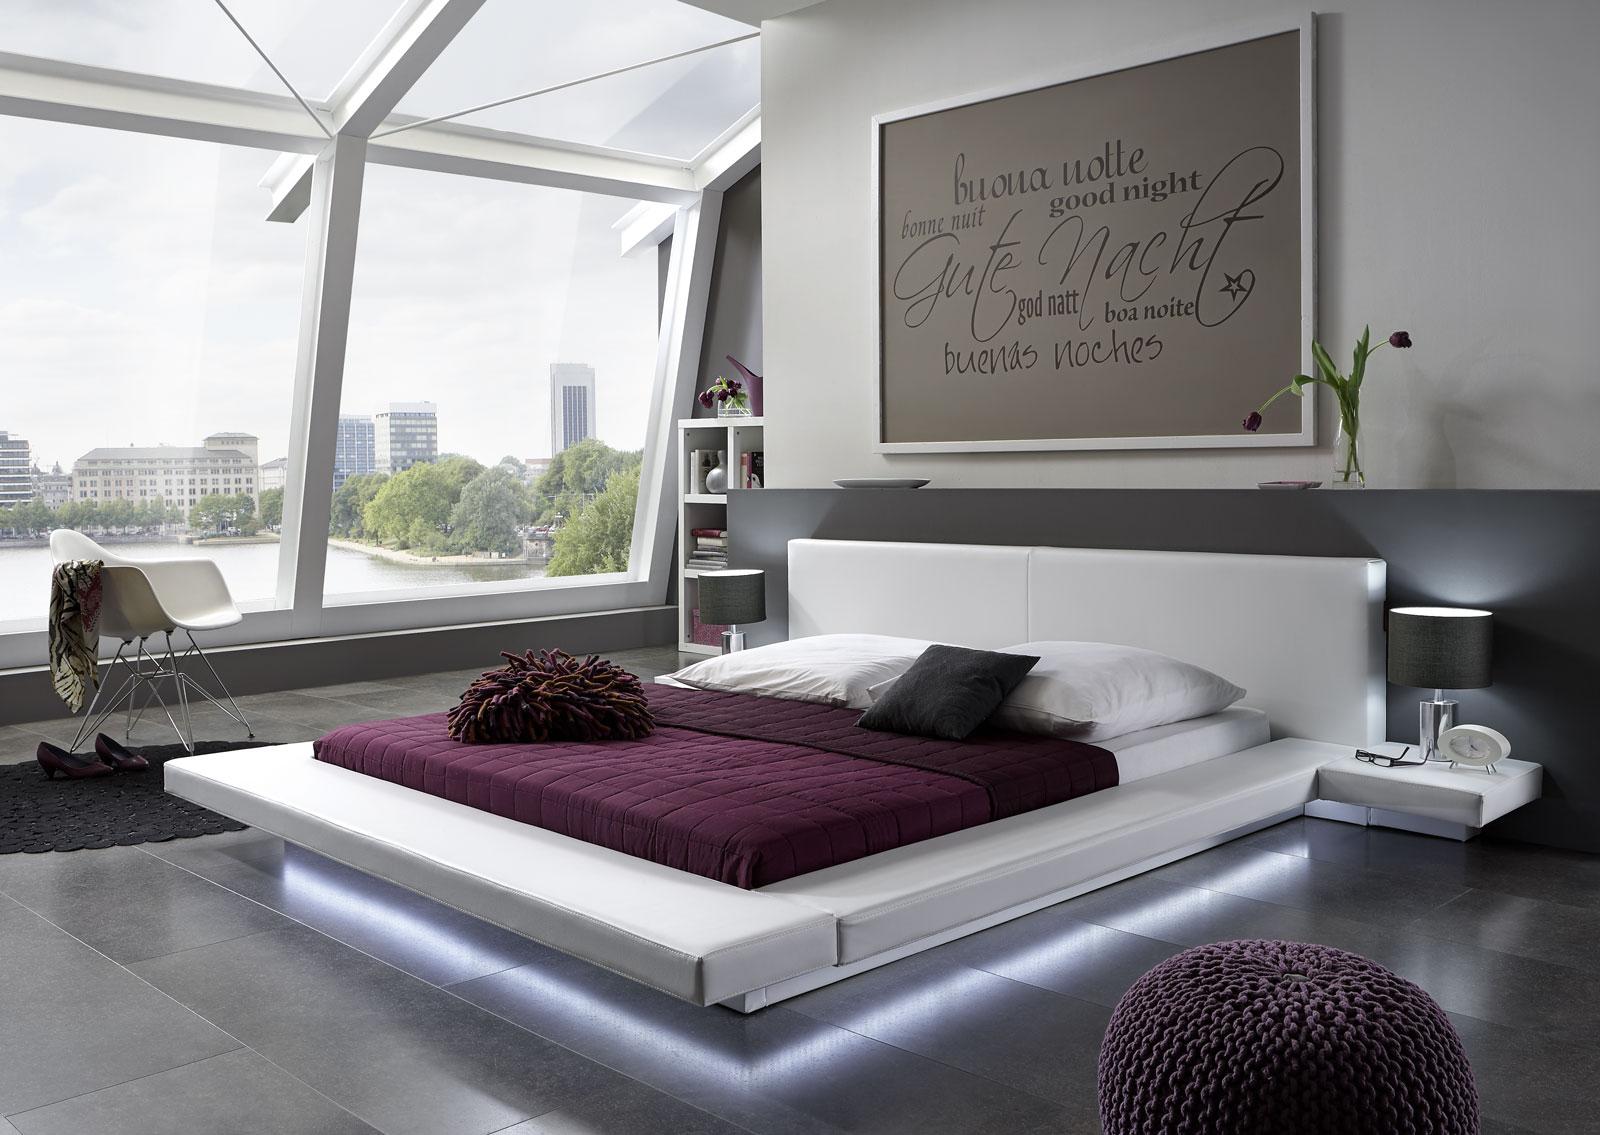 sam polsterbett 140 x 200 cm wei perla led. Black Bedroom Furniture Sets. Home Design Ideas